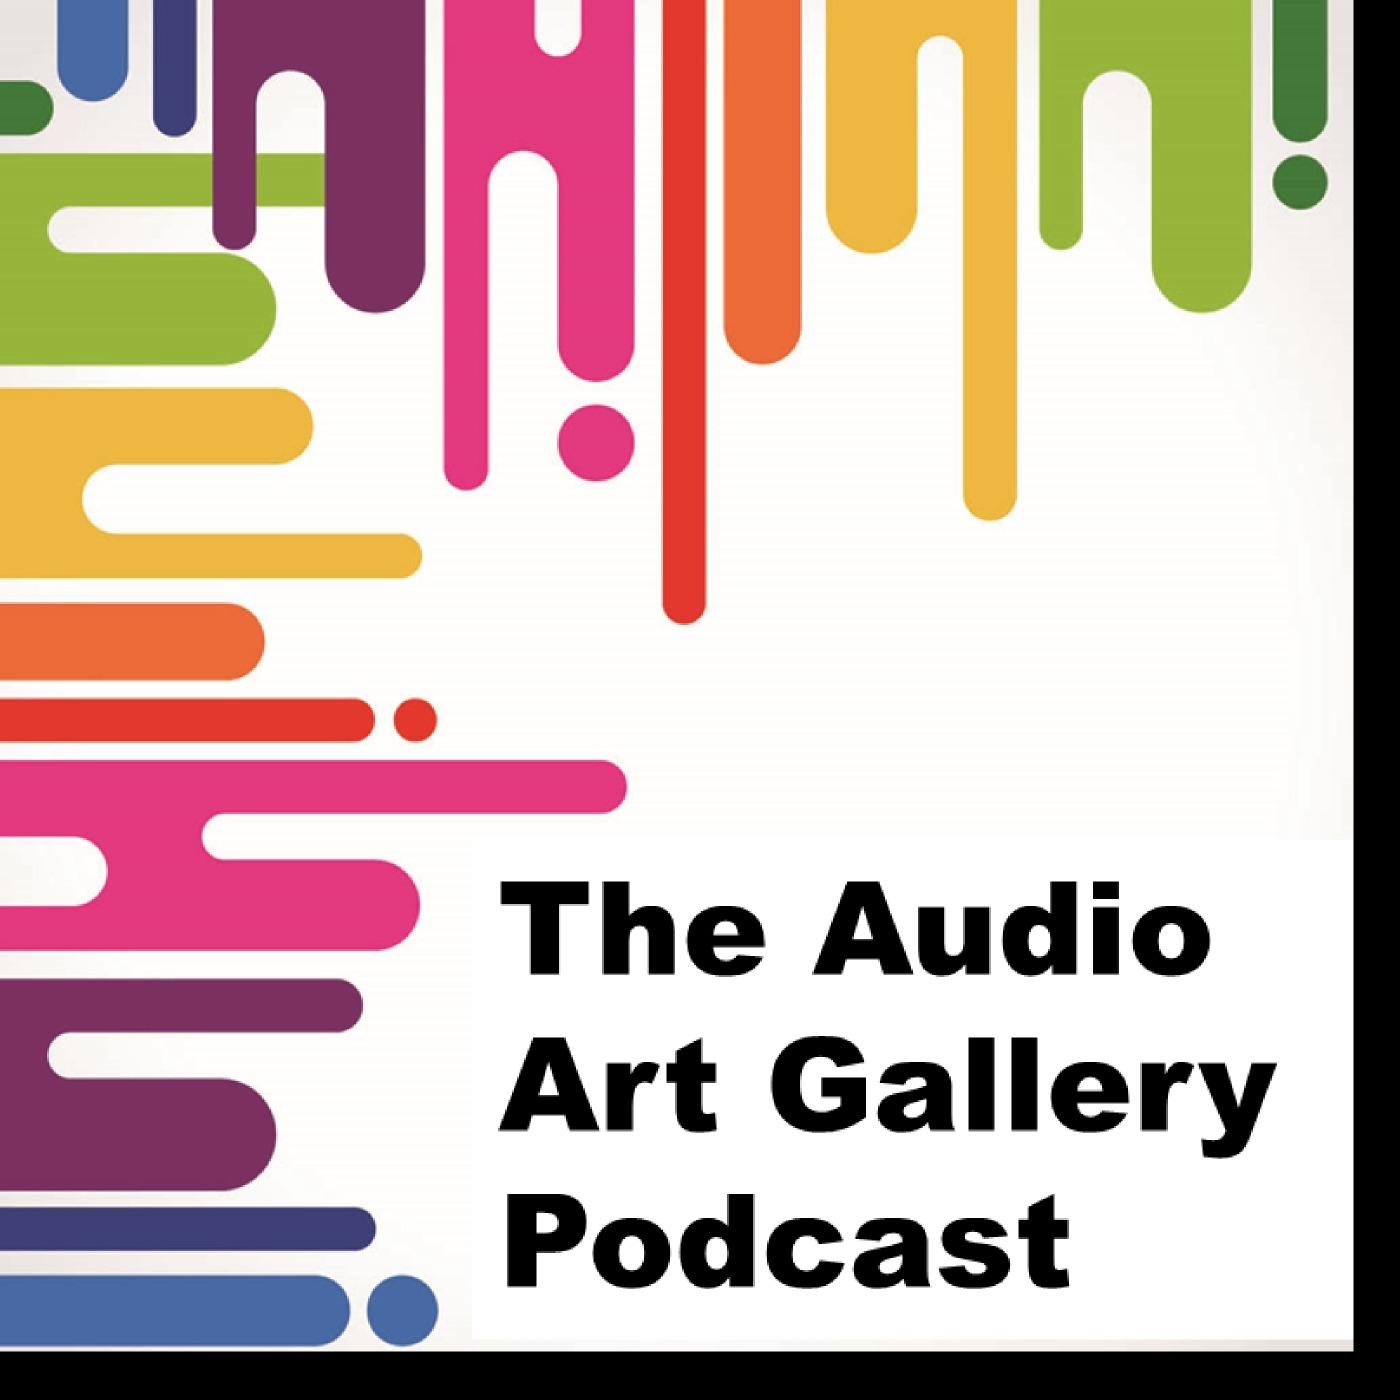 The Audio Art Gallery